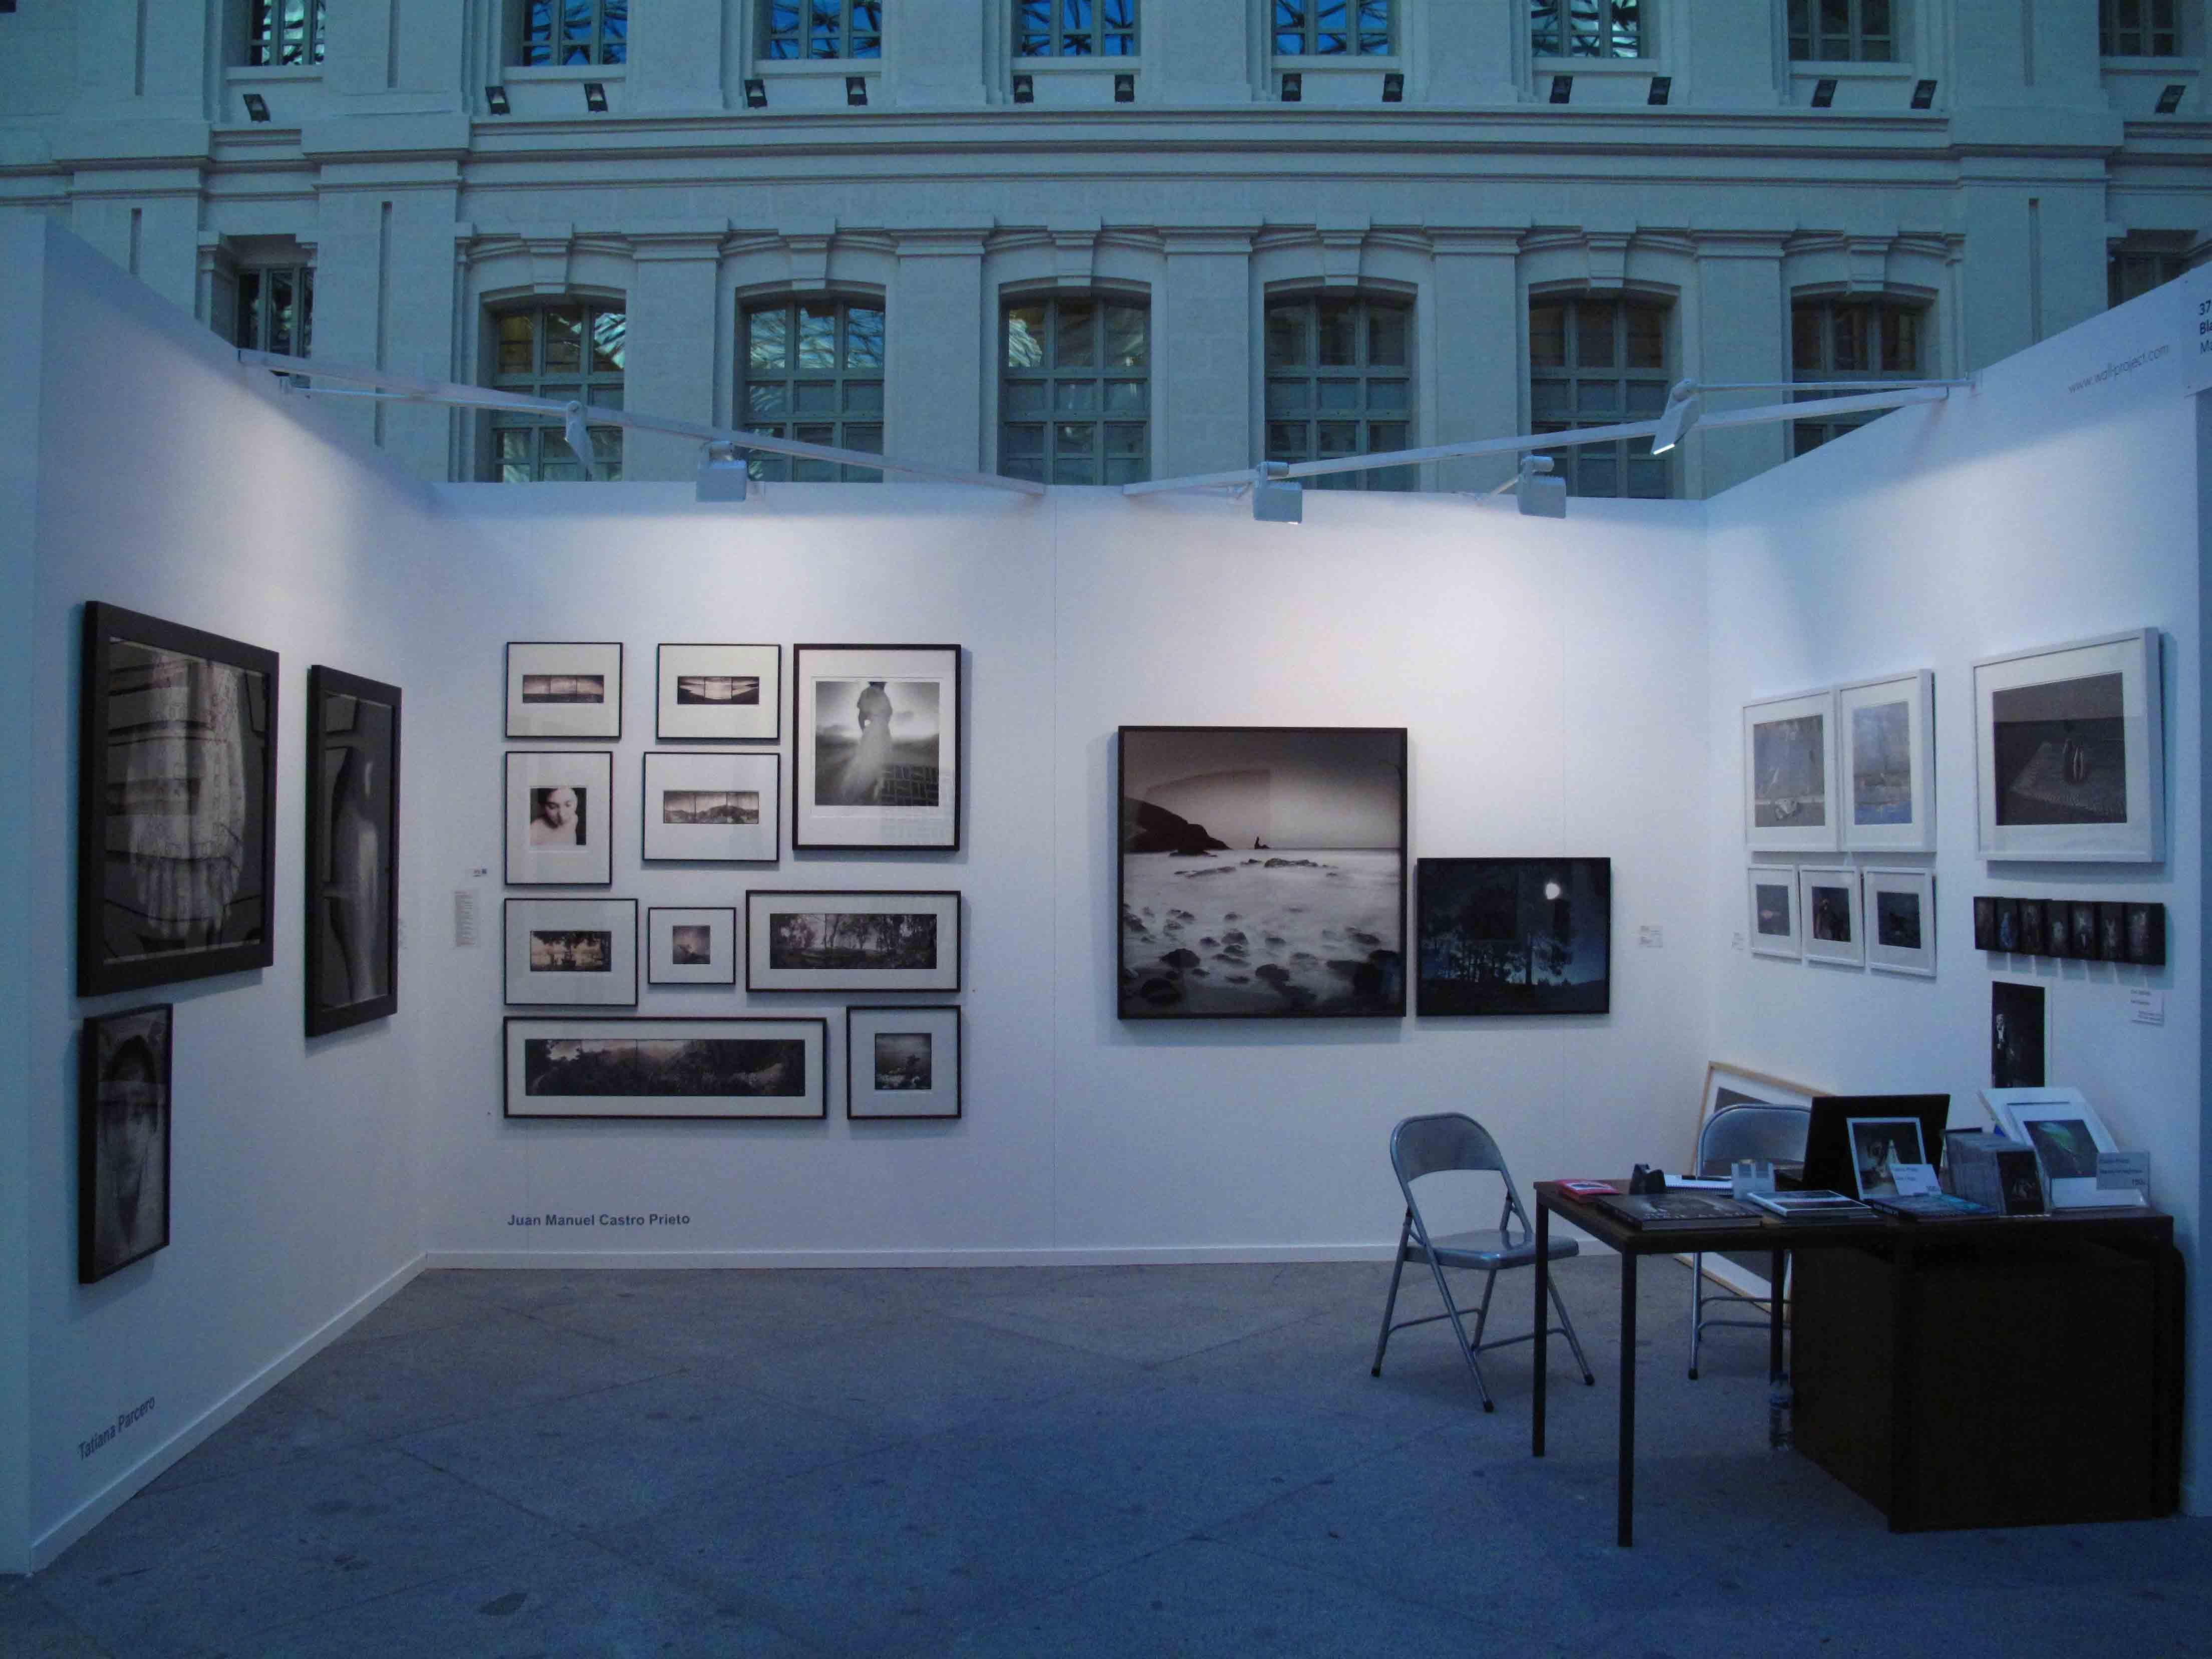 Casa//Arte 2013